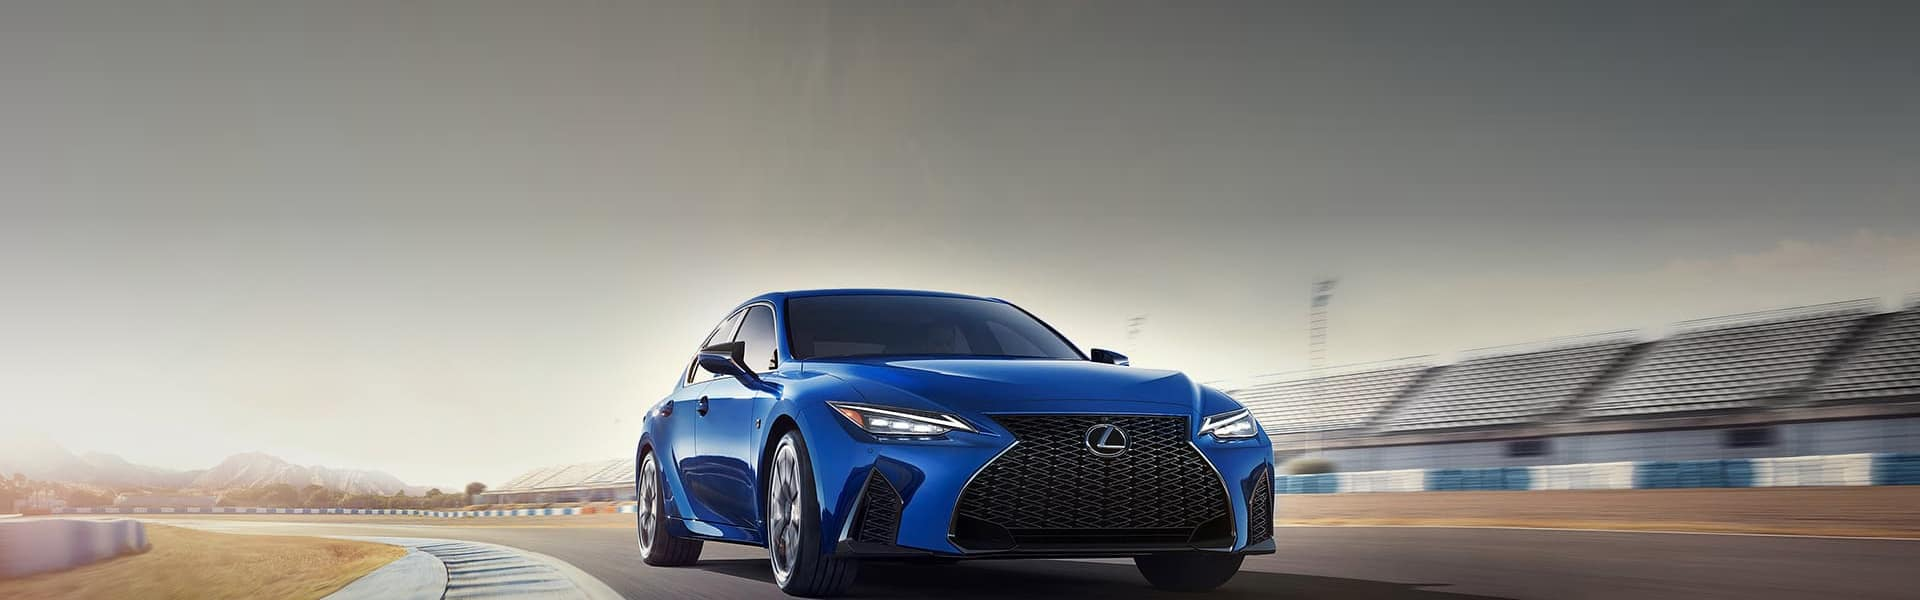 Blue Lexus Driving on racetrack